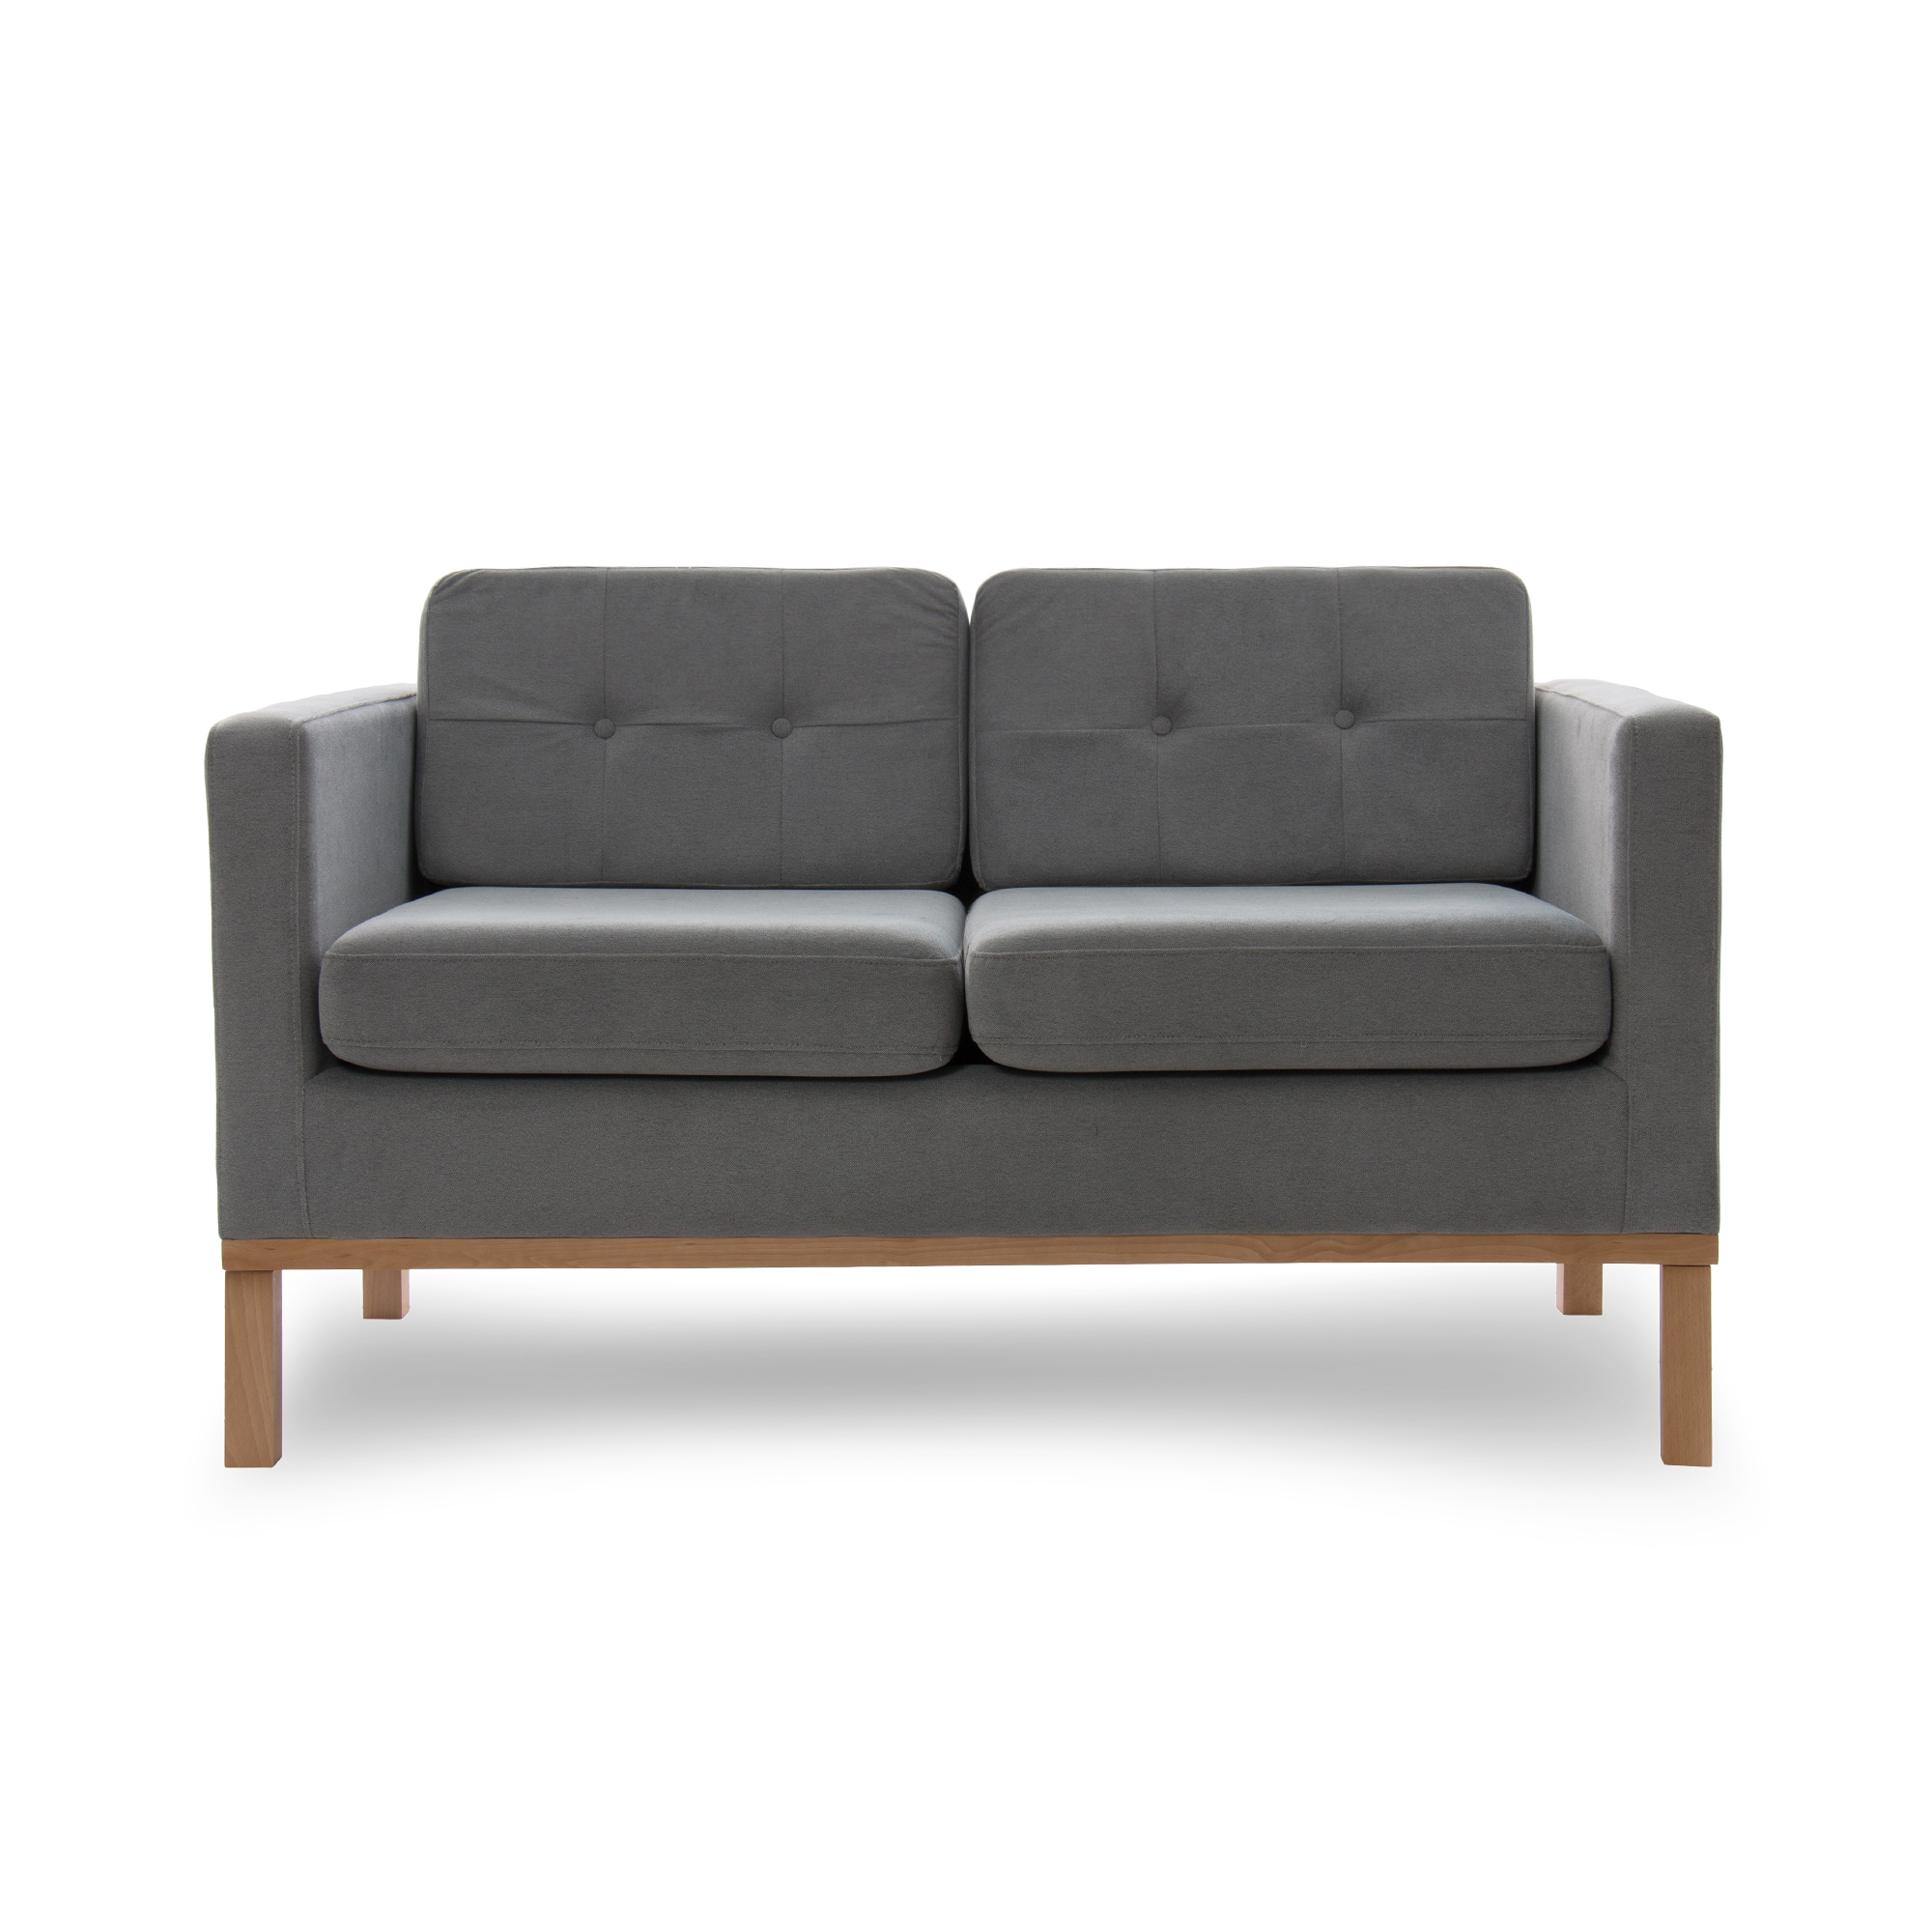 Canapea Fixa 2 locuri Jonan Light Grey/Natural